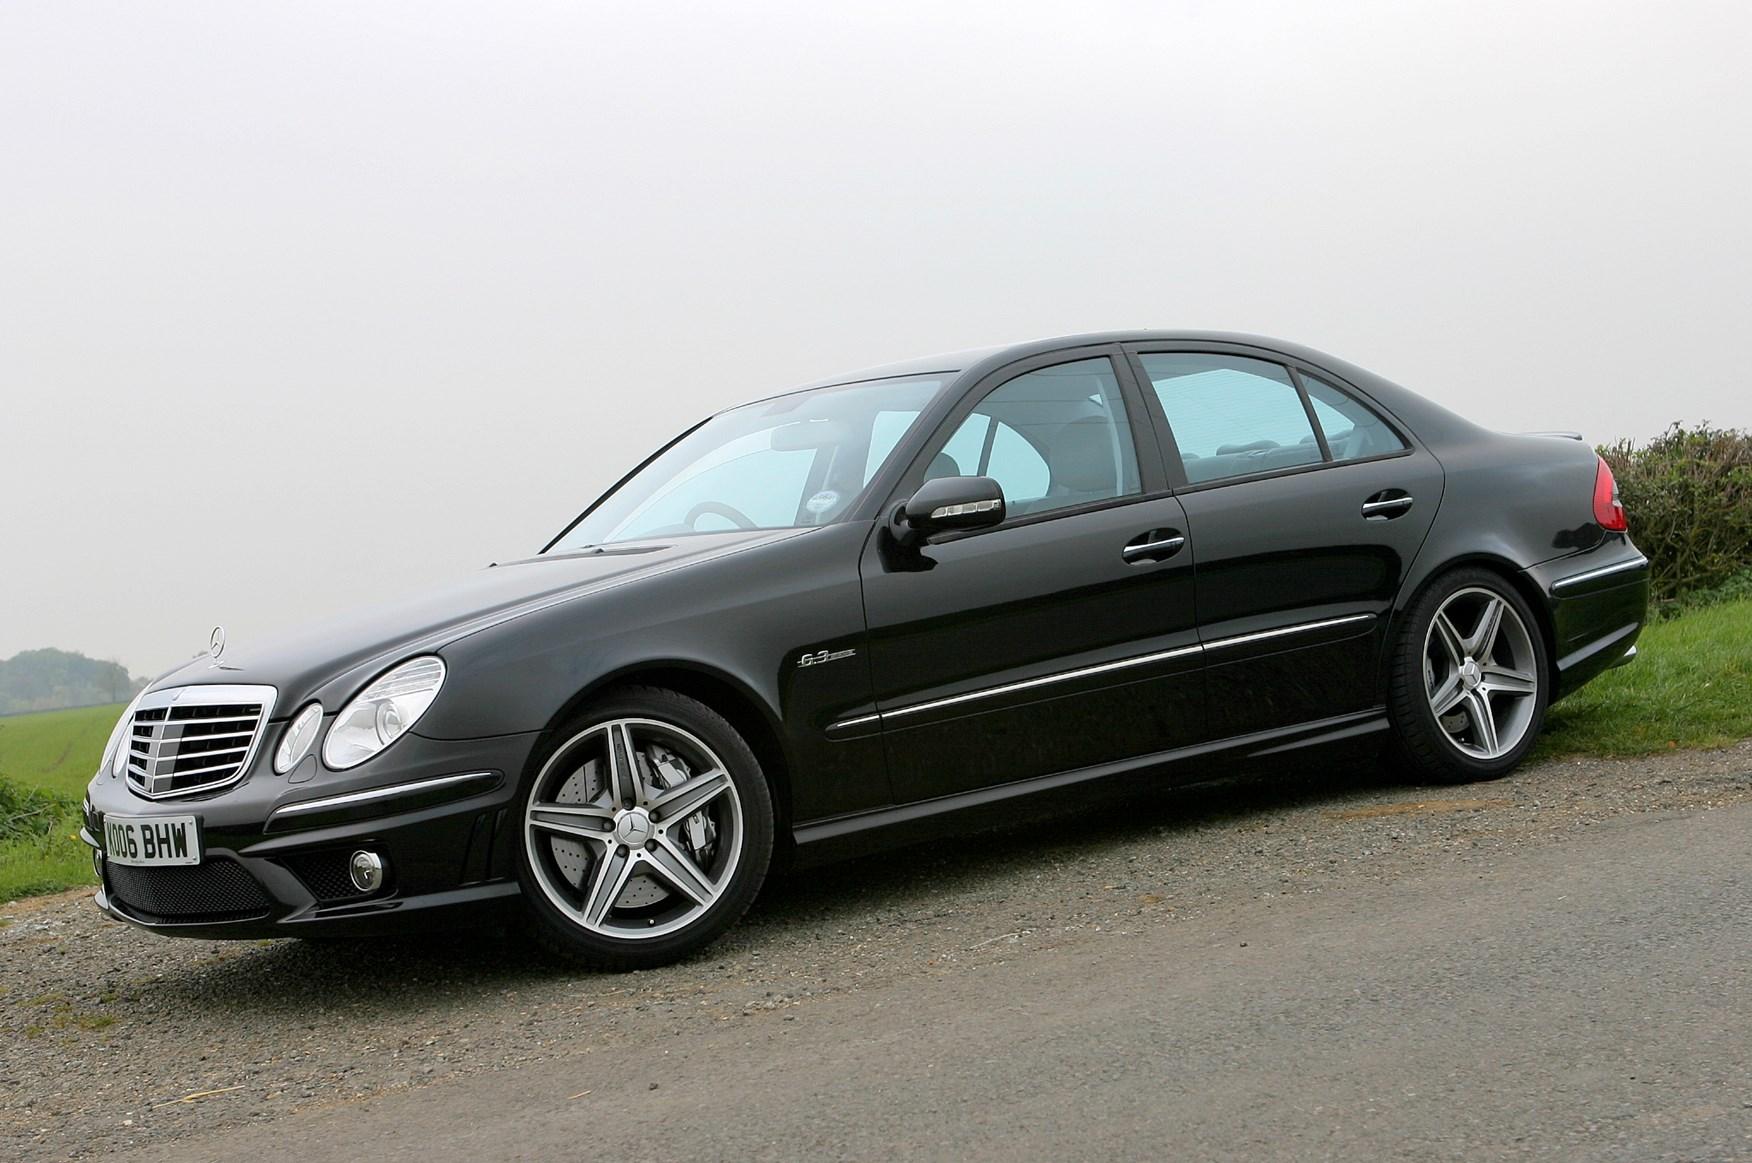 Mercedes benz e class amg 2002 2008 features for Mercedes benz e class accessories